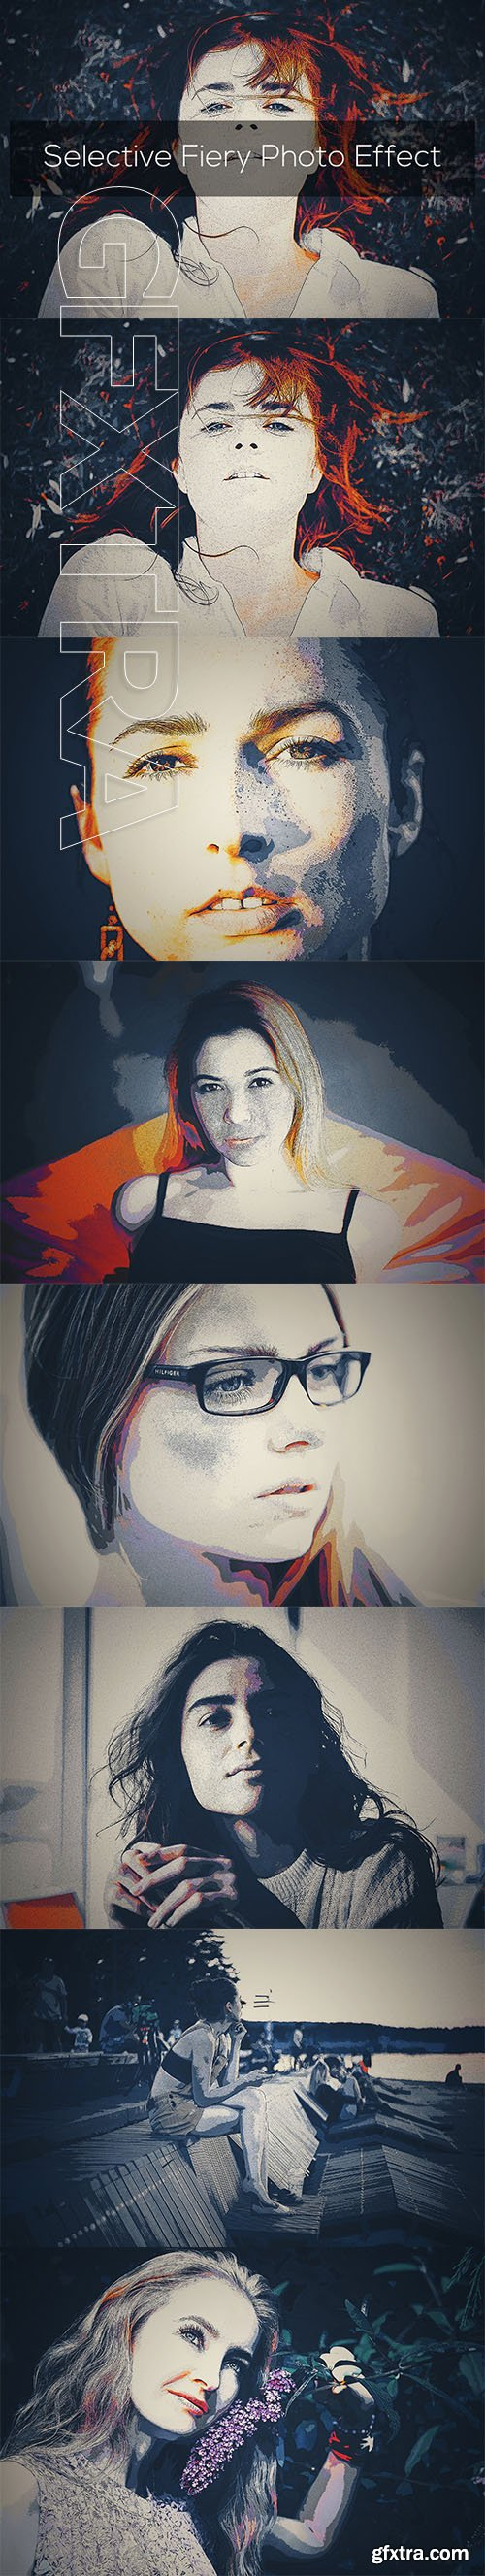 CreativeMarket - Selective Fiery Photo Effect 3296978